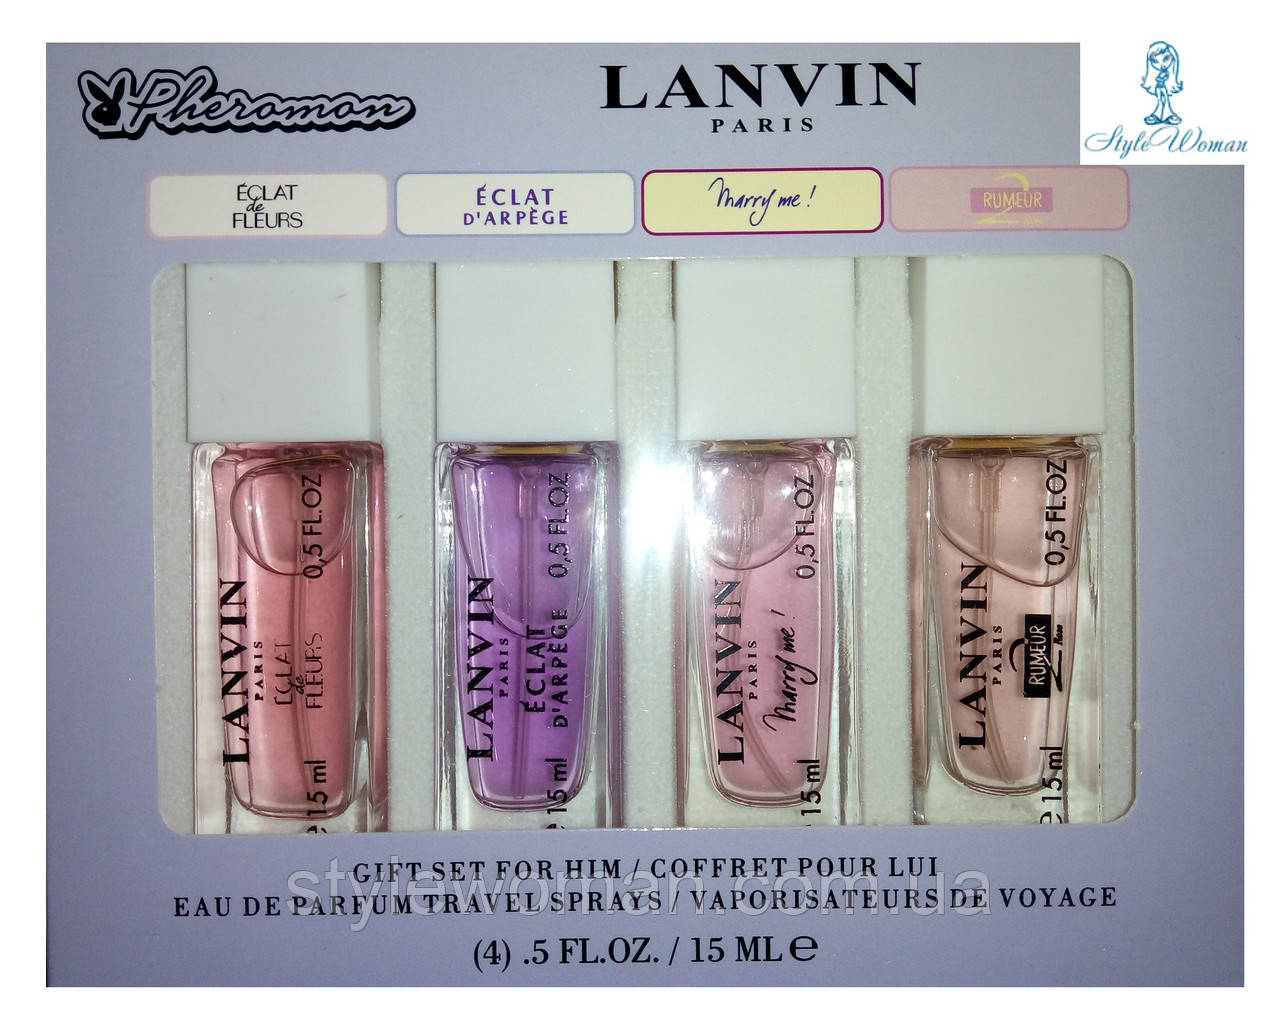 Парфюмерный набор с феромонами Lanvin Ланвин мини 4 по 15мл женский топ аромат